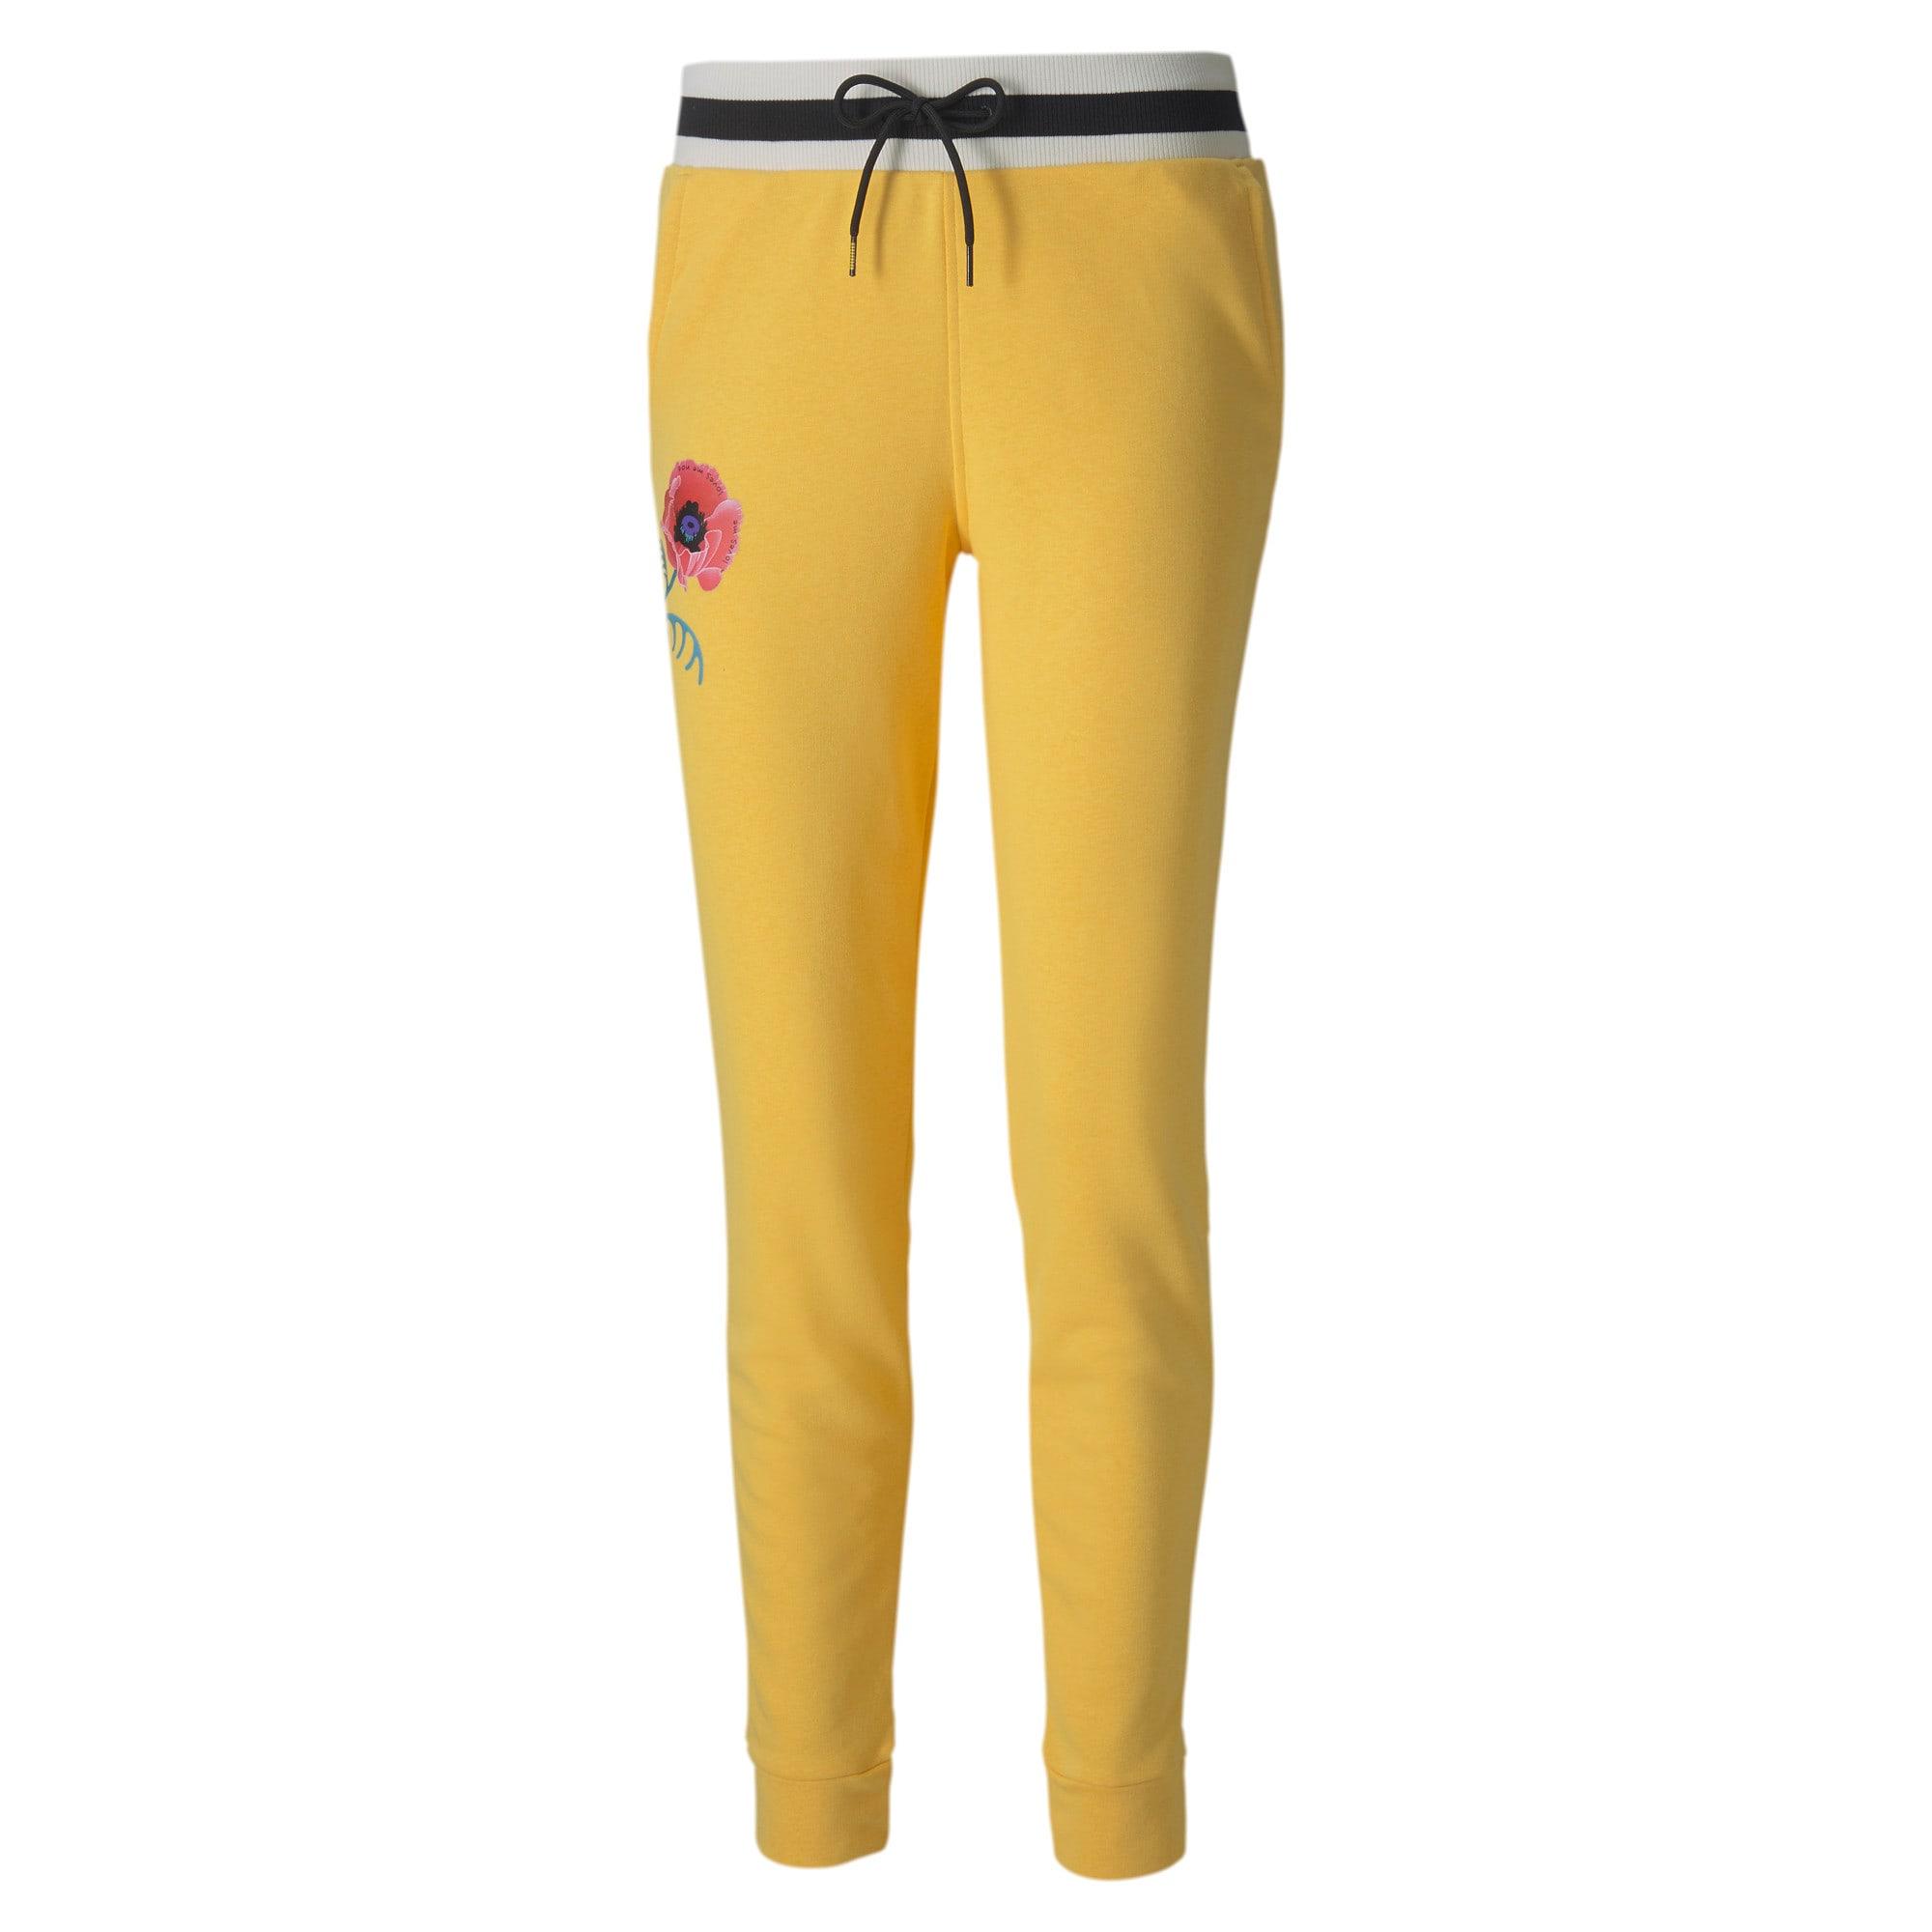 Thumbnail 1 of PUMA x SUE TSAI sweatpants voor dames, Daffodil, medium